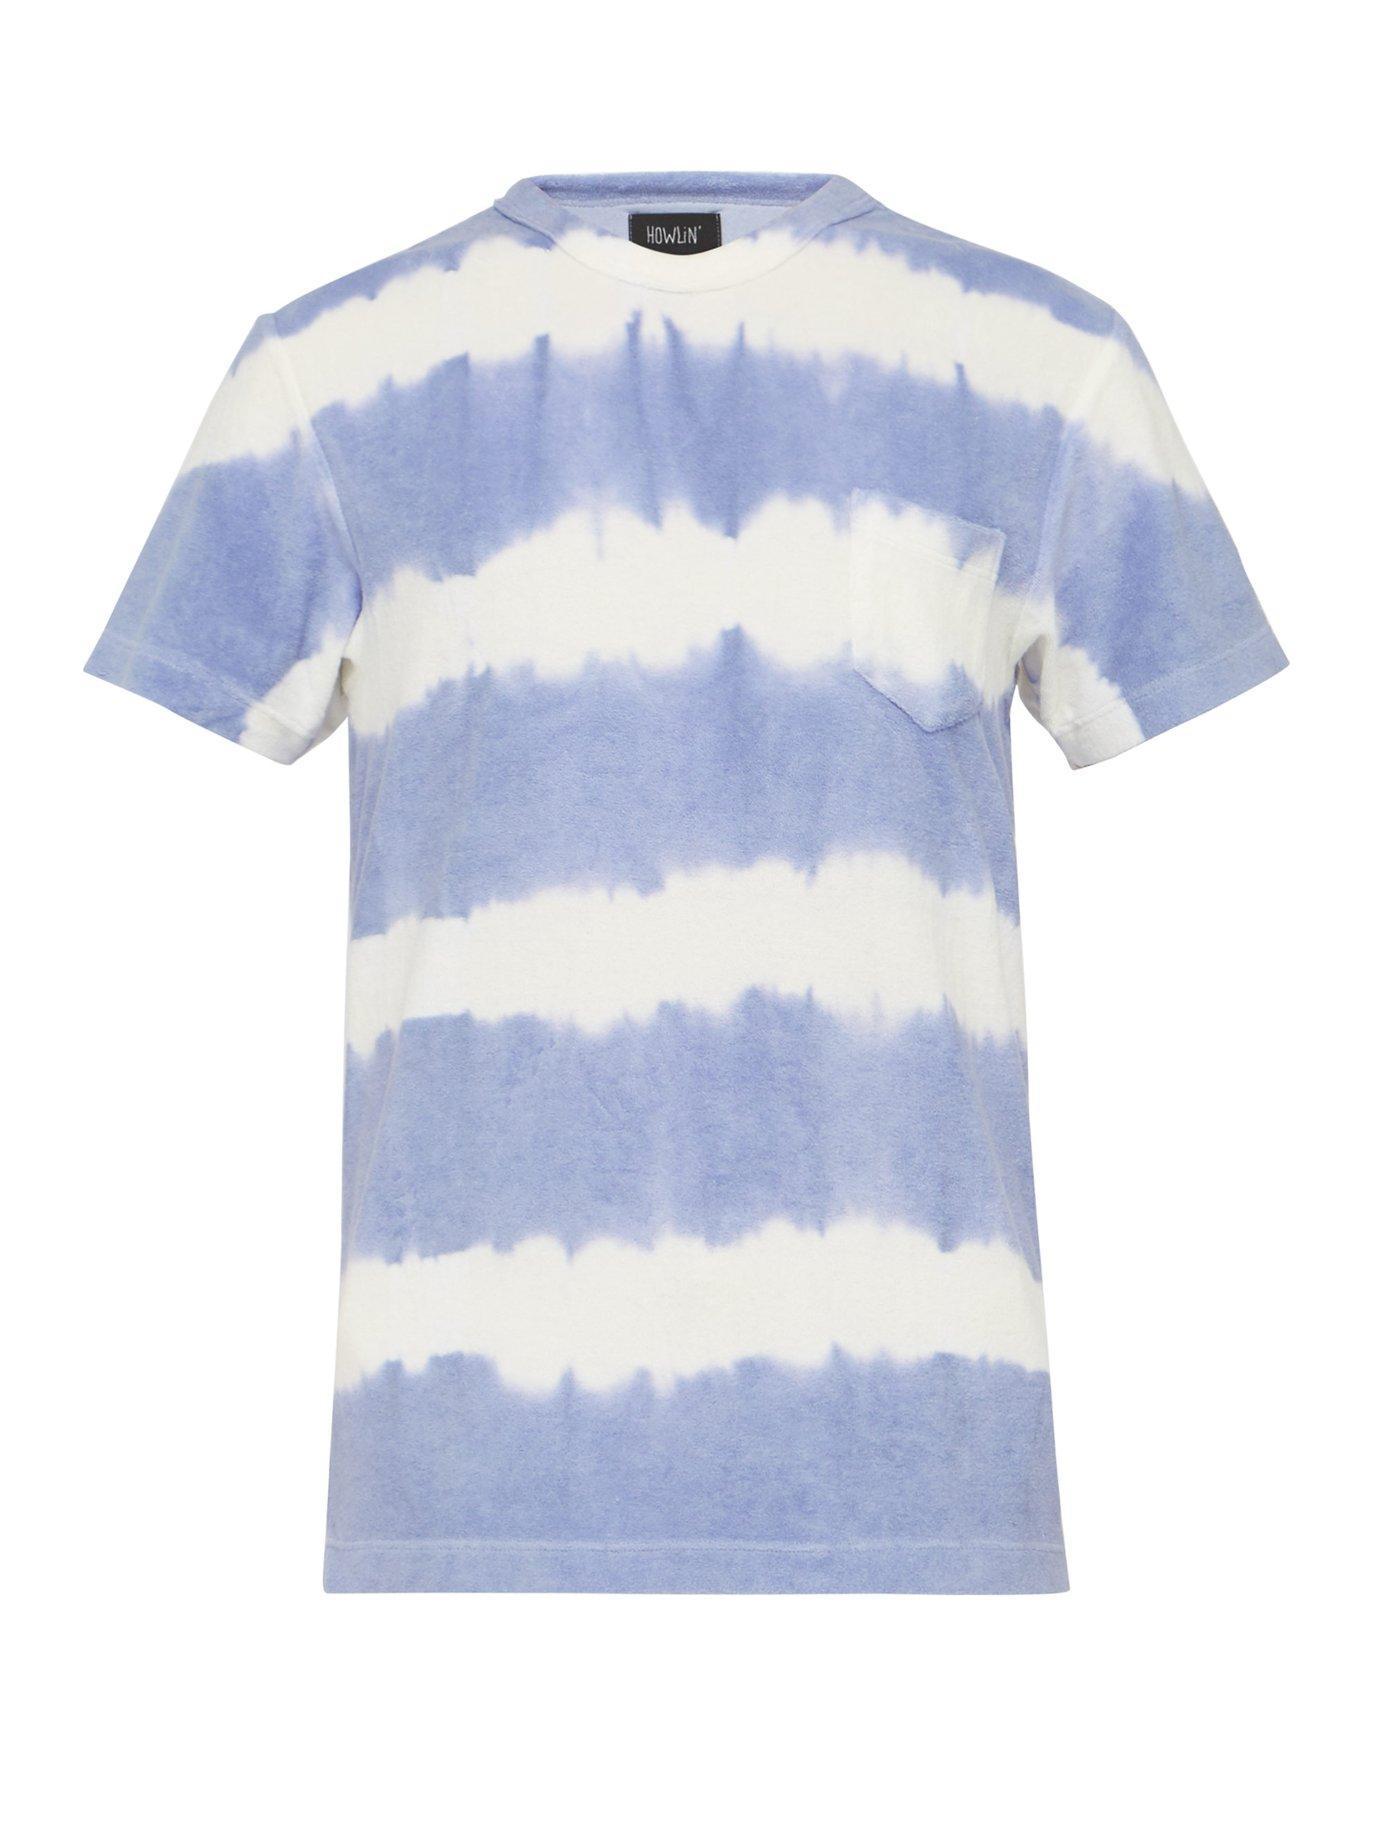 0218f3b7fbd Lyst - Howlin' By Morrison Fons Cotton Blend Terry T Shirt in Purple ...